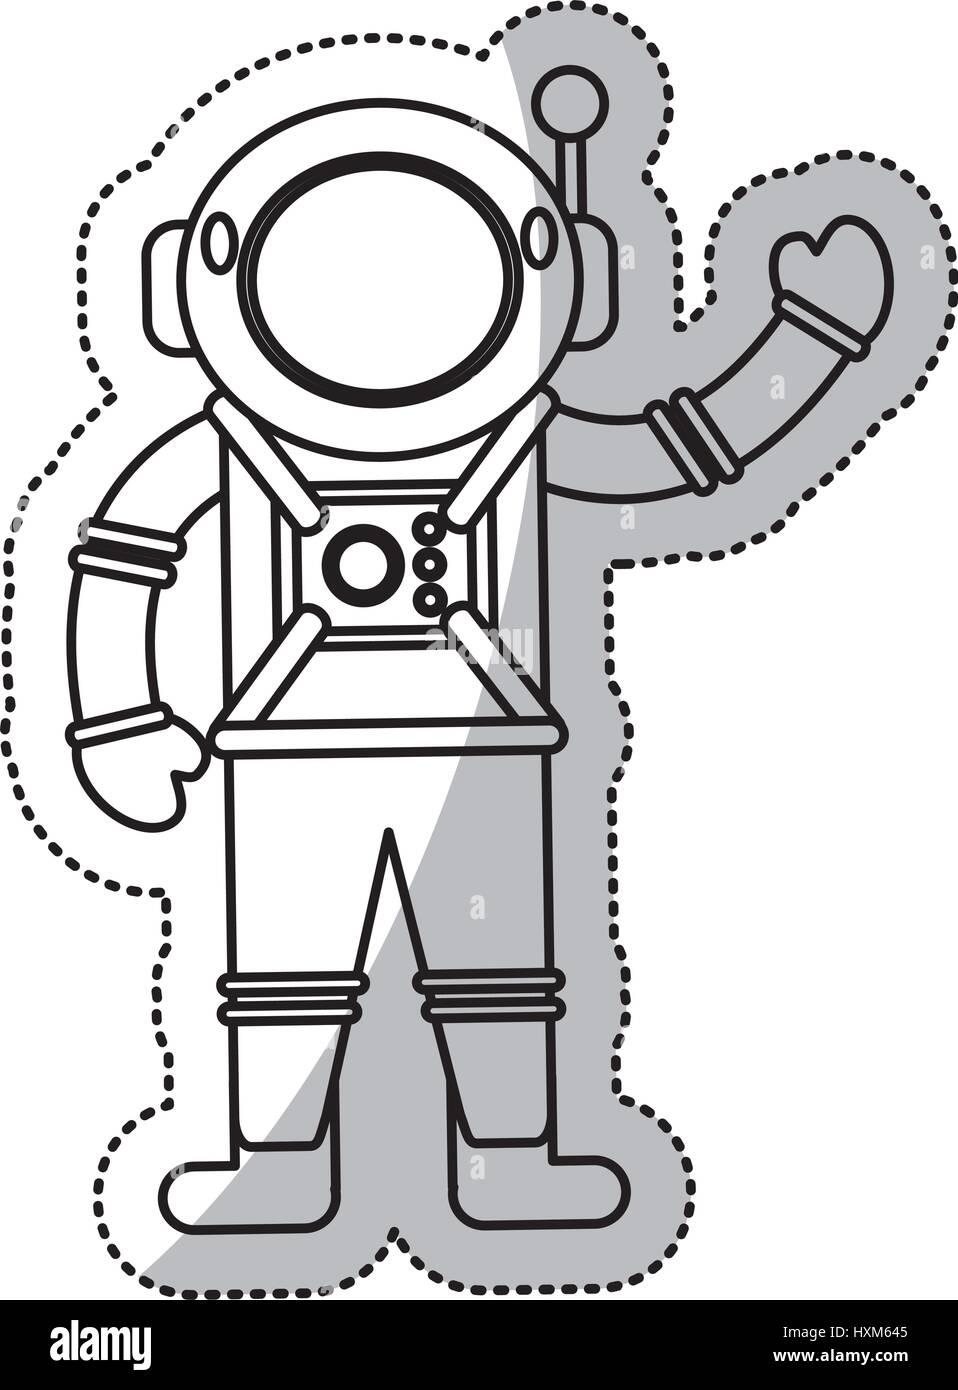 astronaut space suit helmet outline